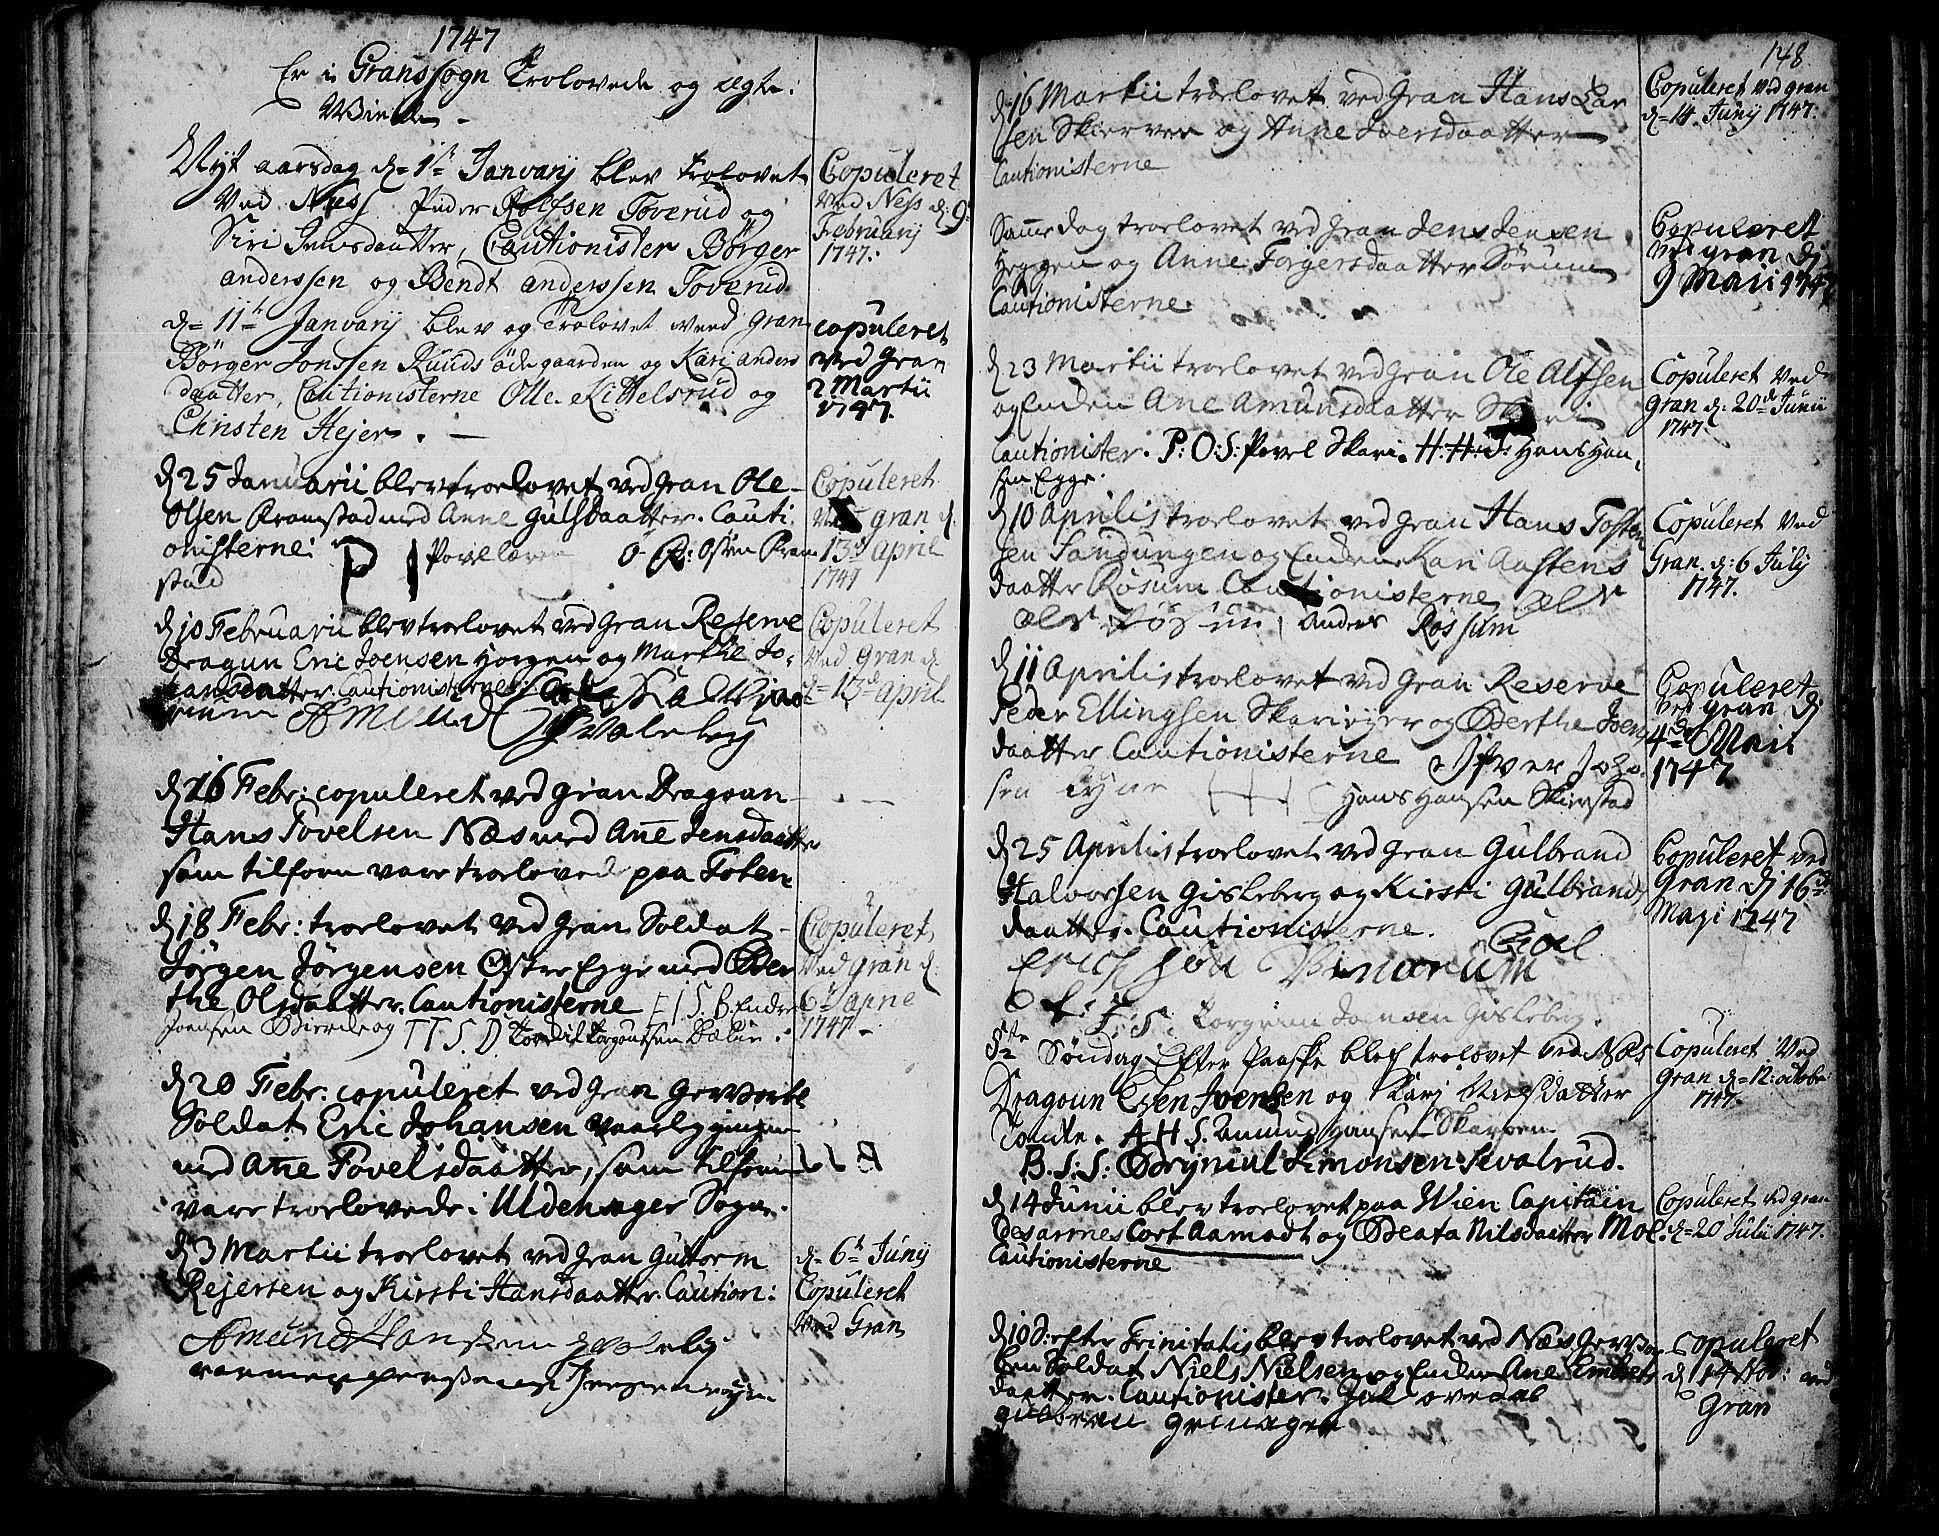 SAH, Gran prestekontor, Ministerialbok nr. 3, 1745-1758, s. 148